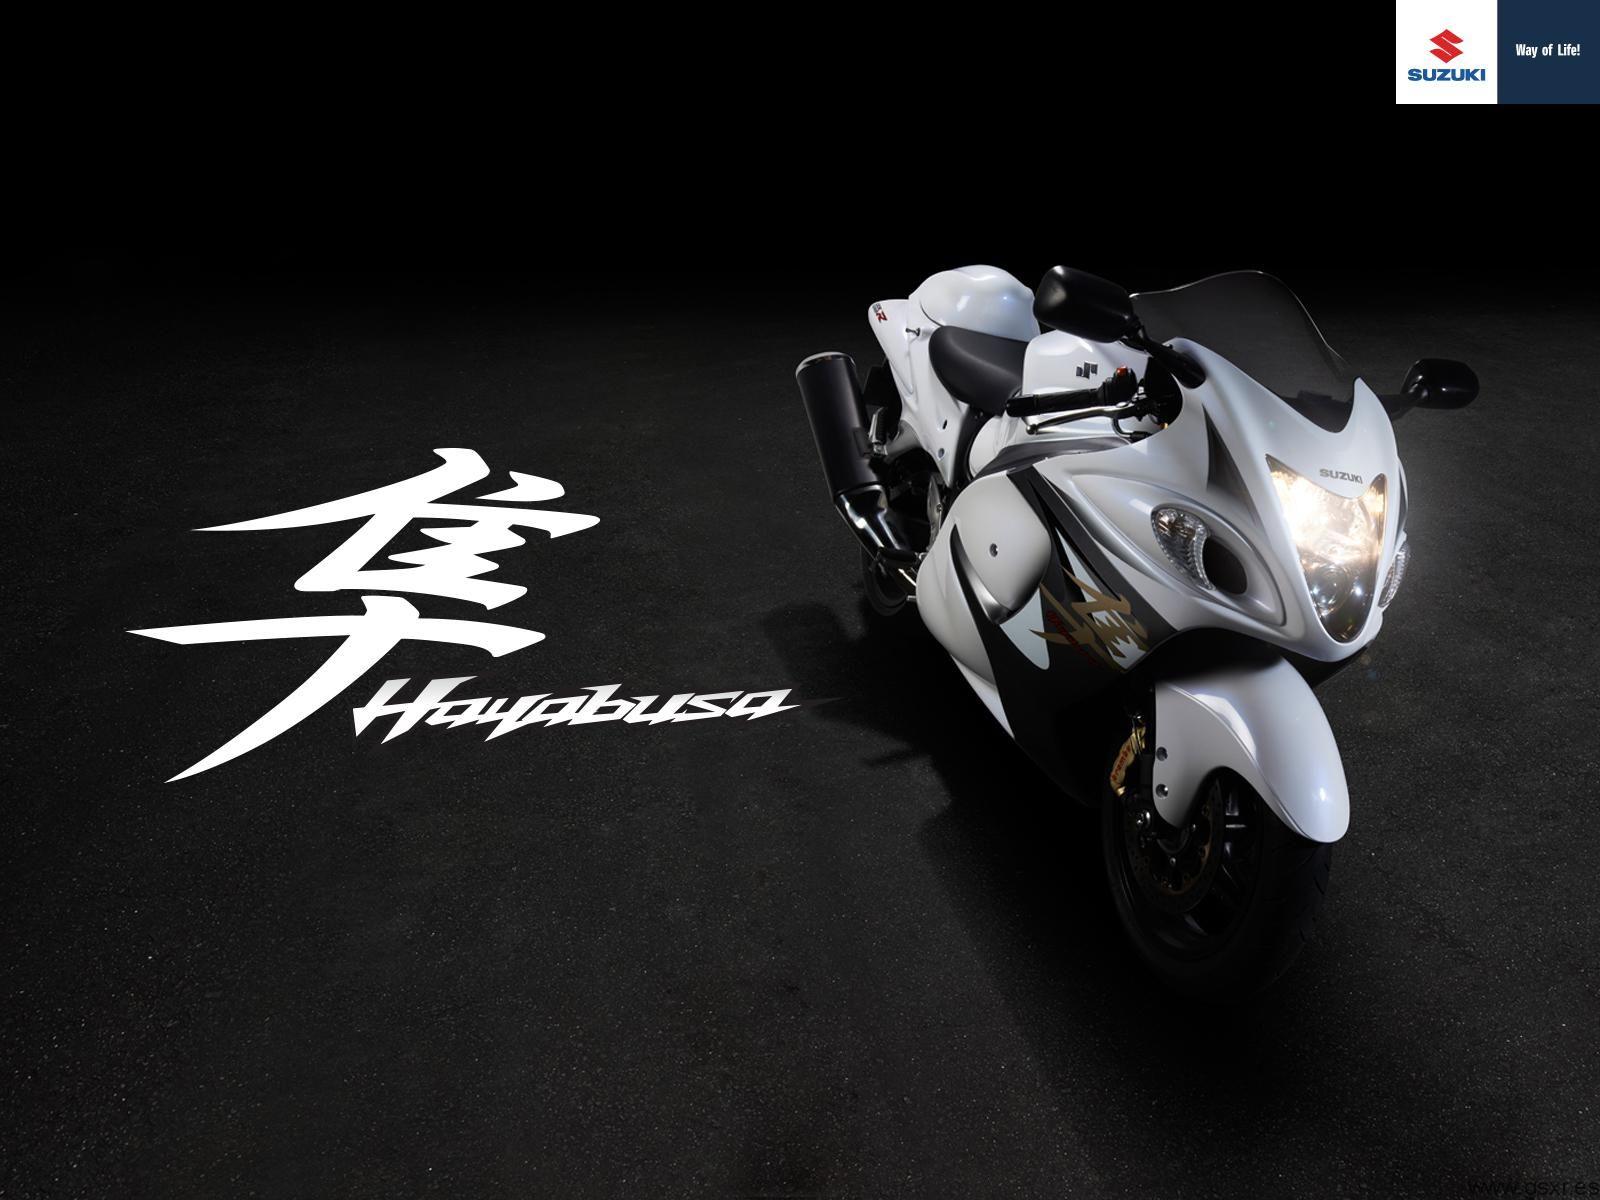 2009 Suzuki Hayabusa GSX 1300 R Wallpapers HD